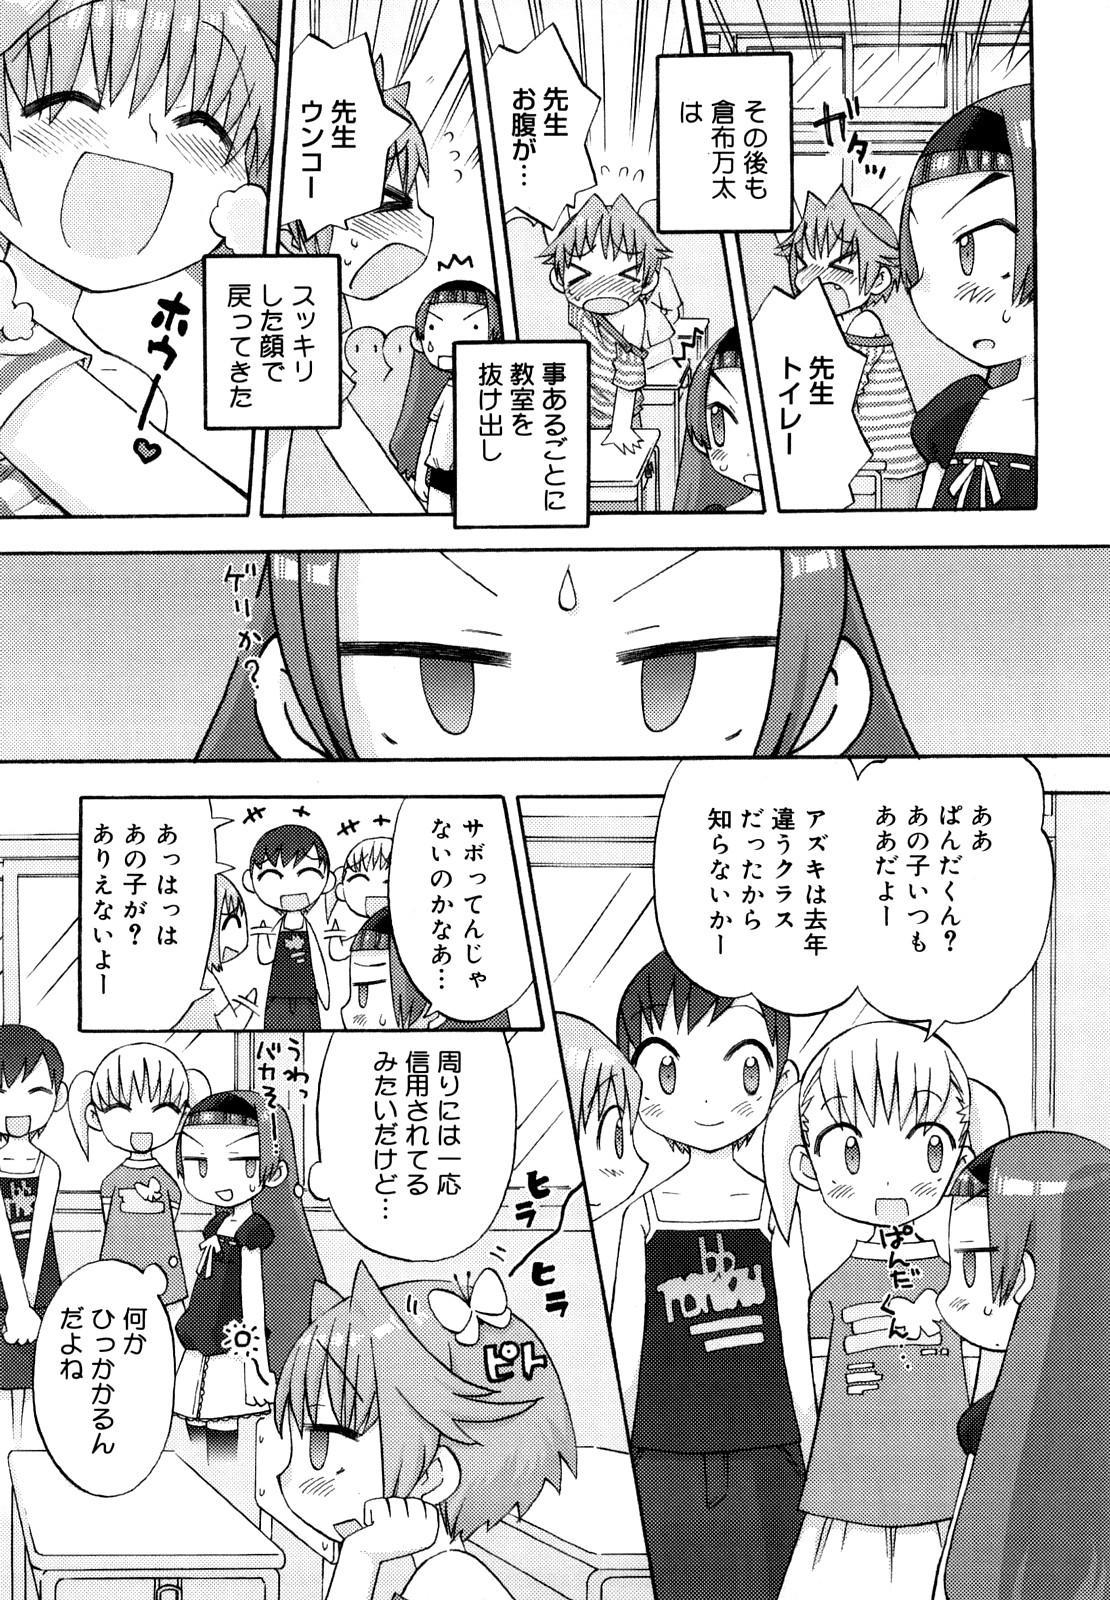 Hatsuden Pandakun! Shinsouban 13